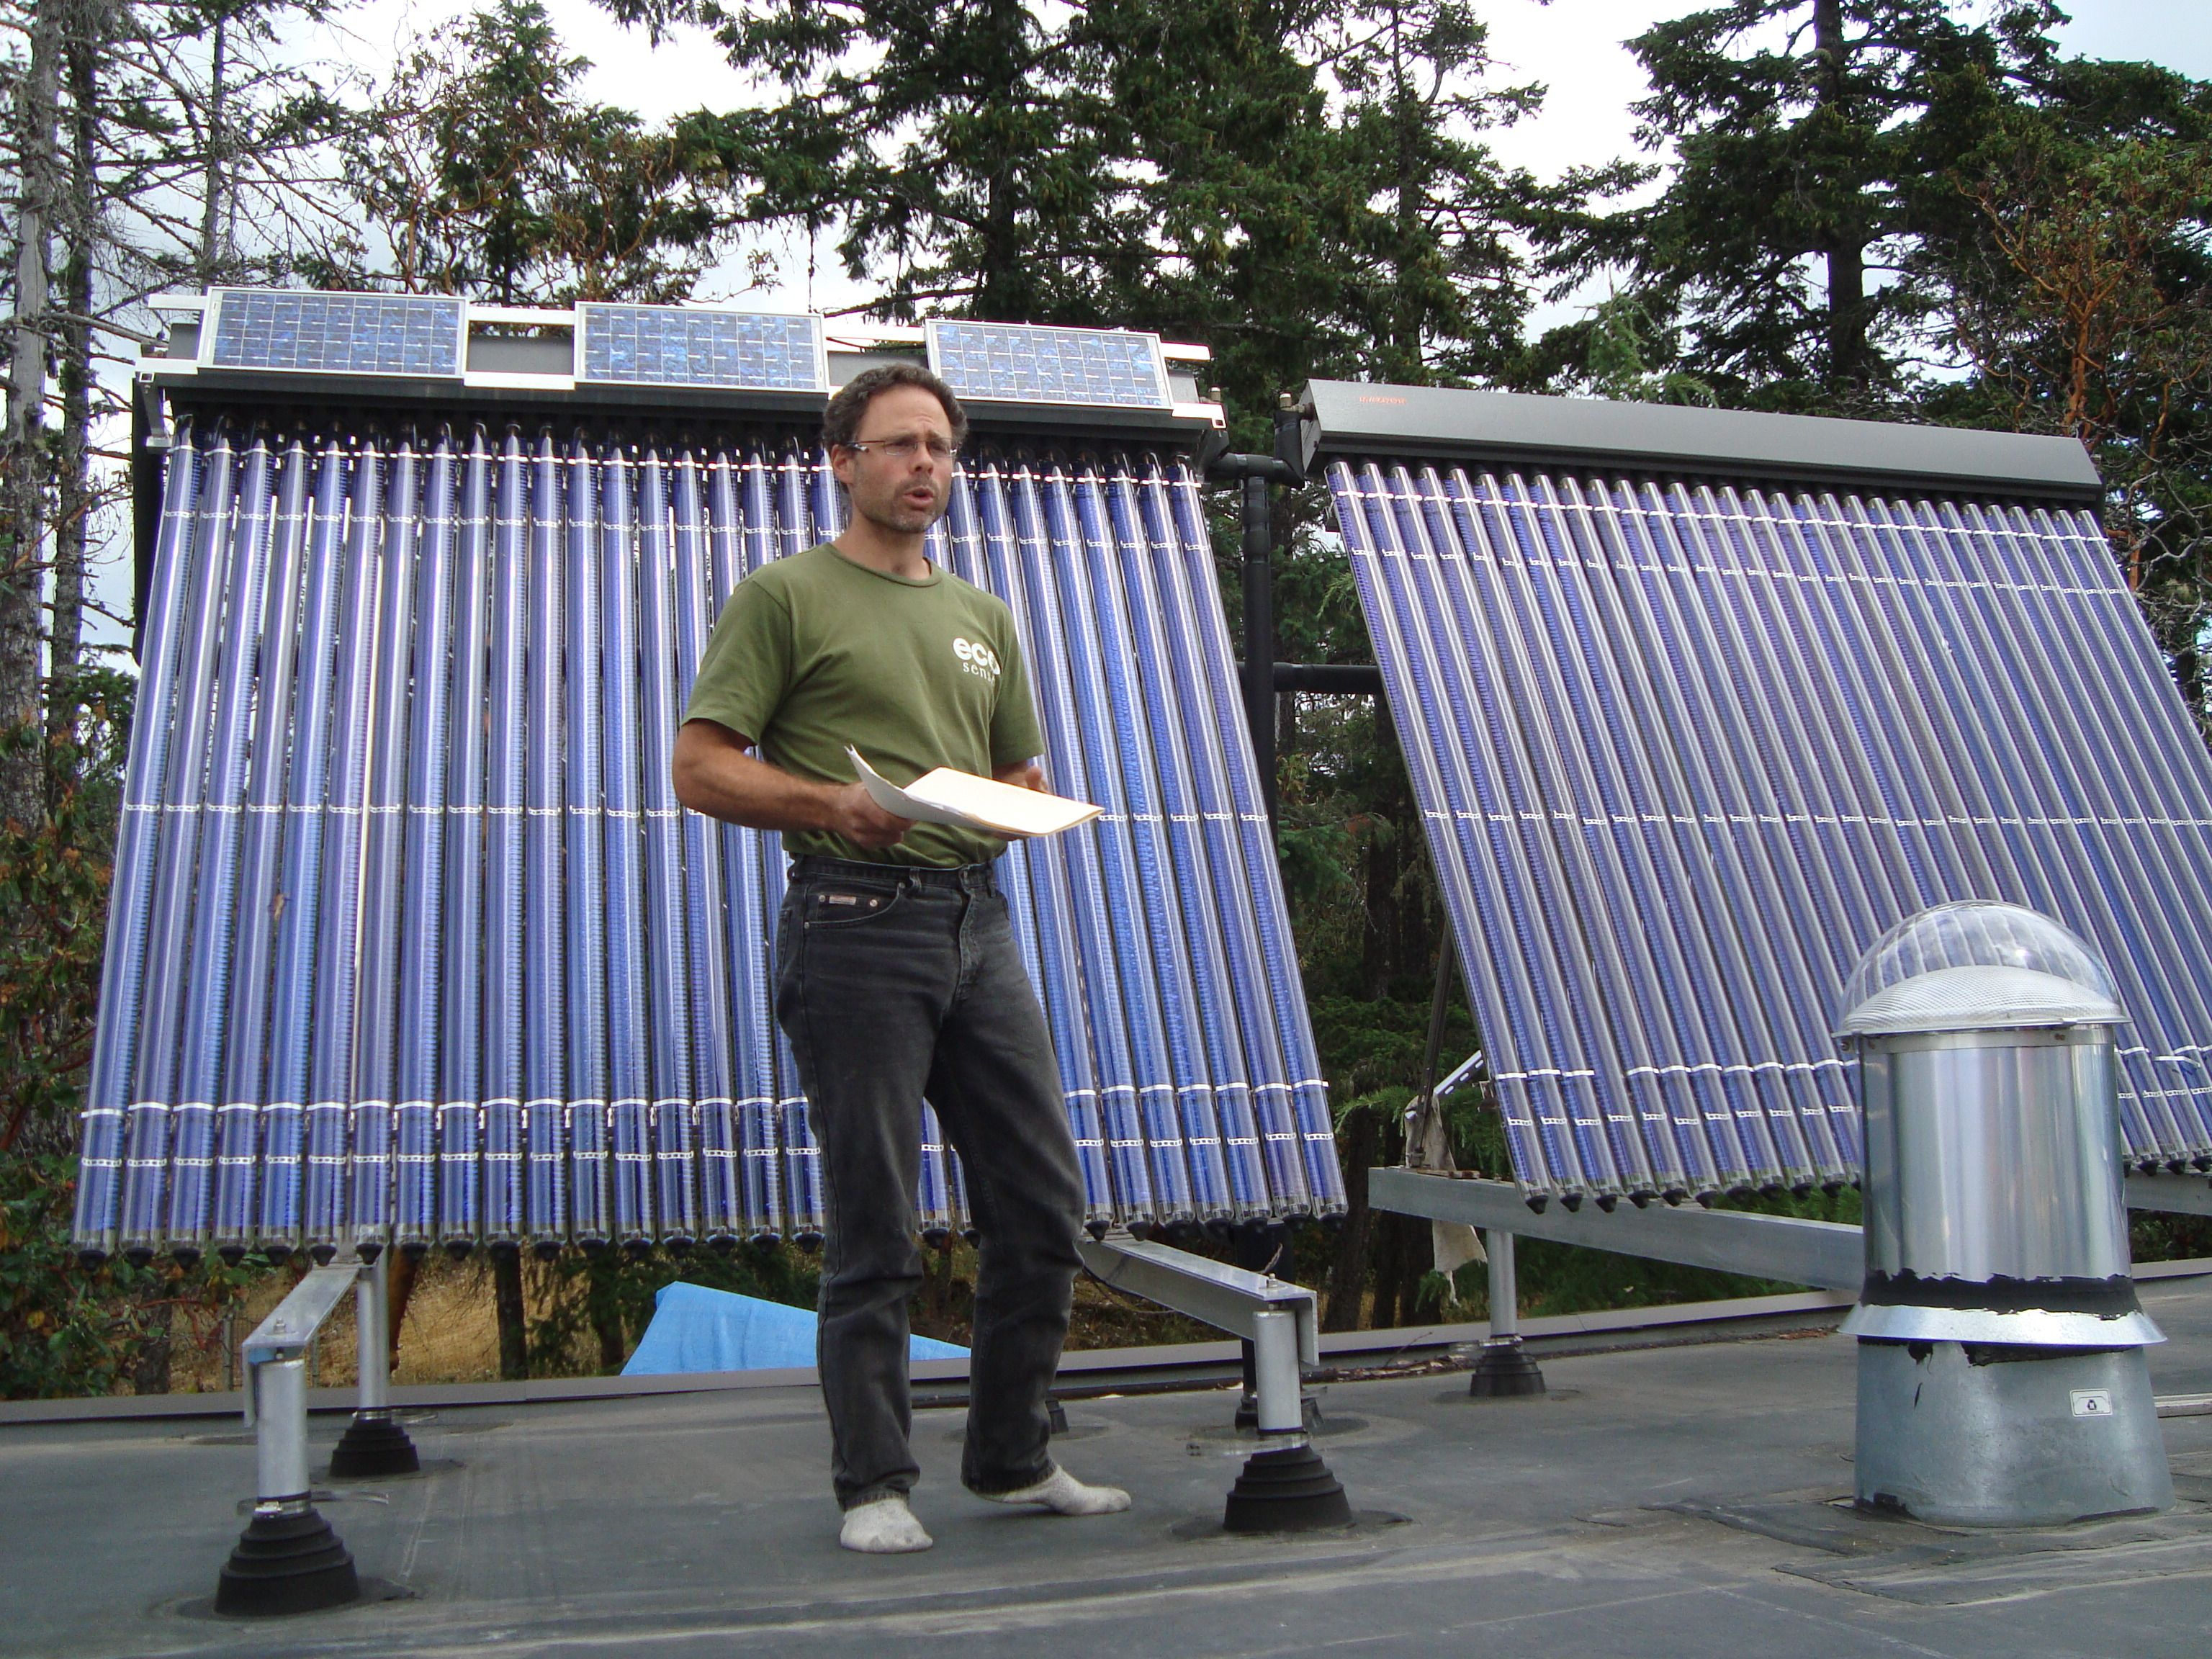 gord and solar hw